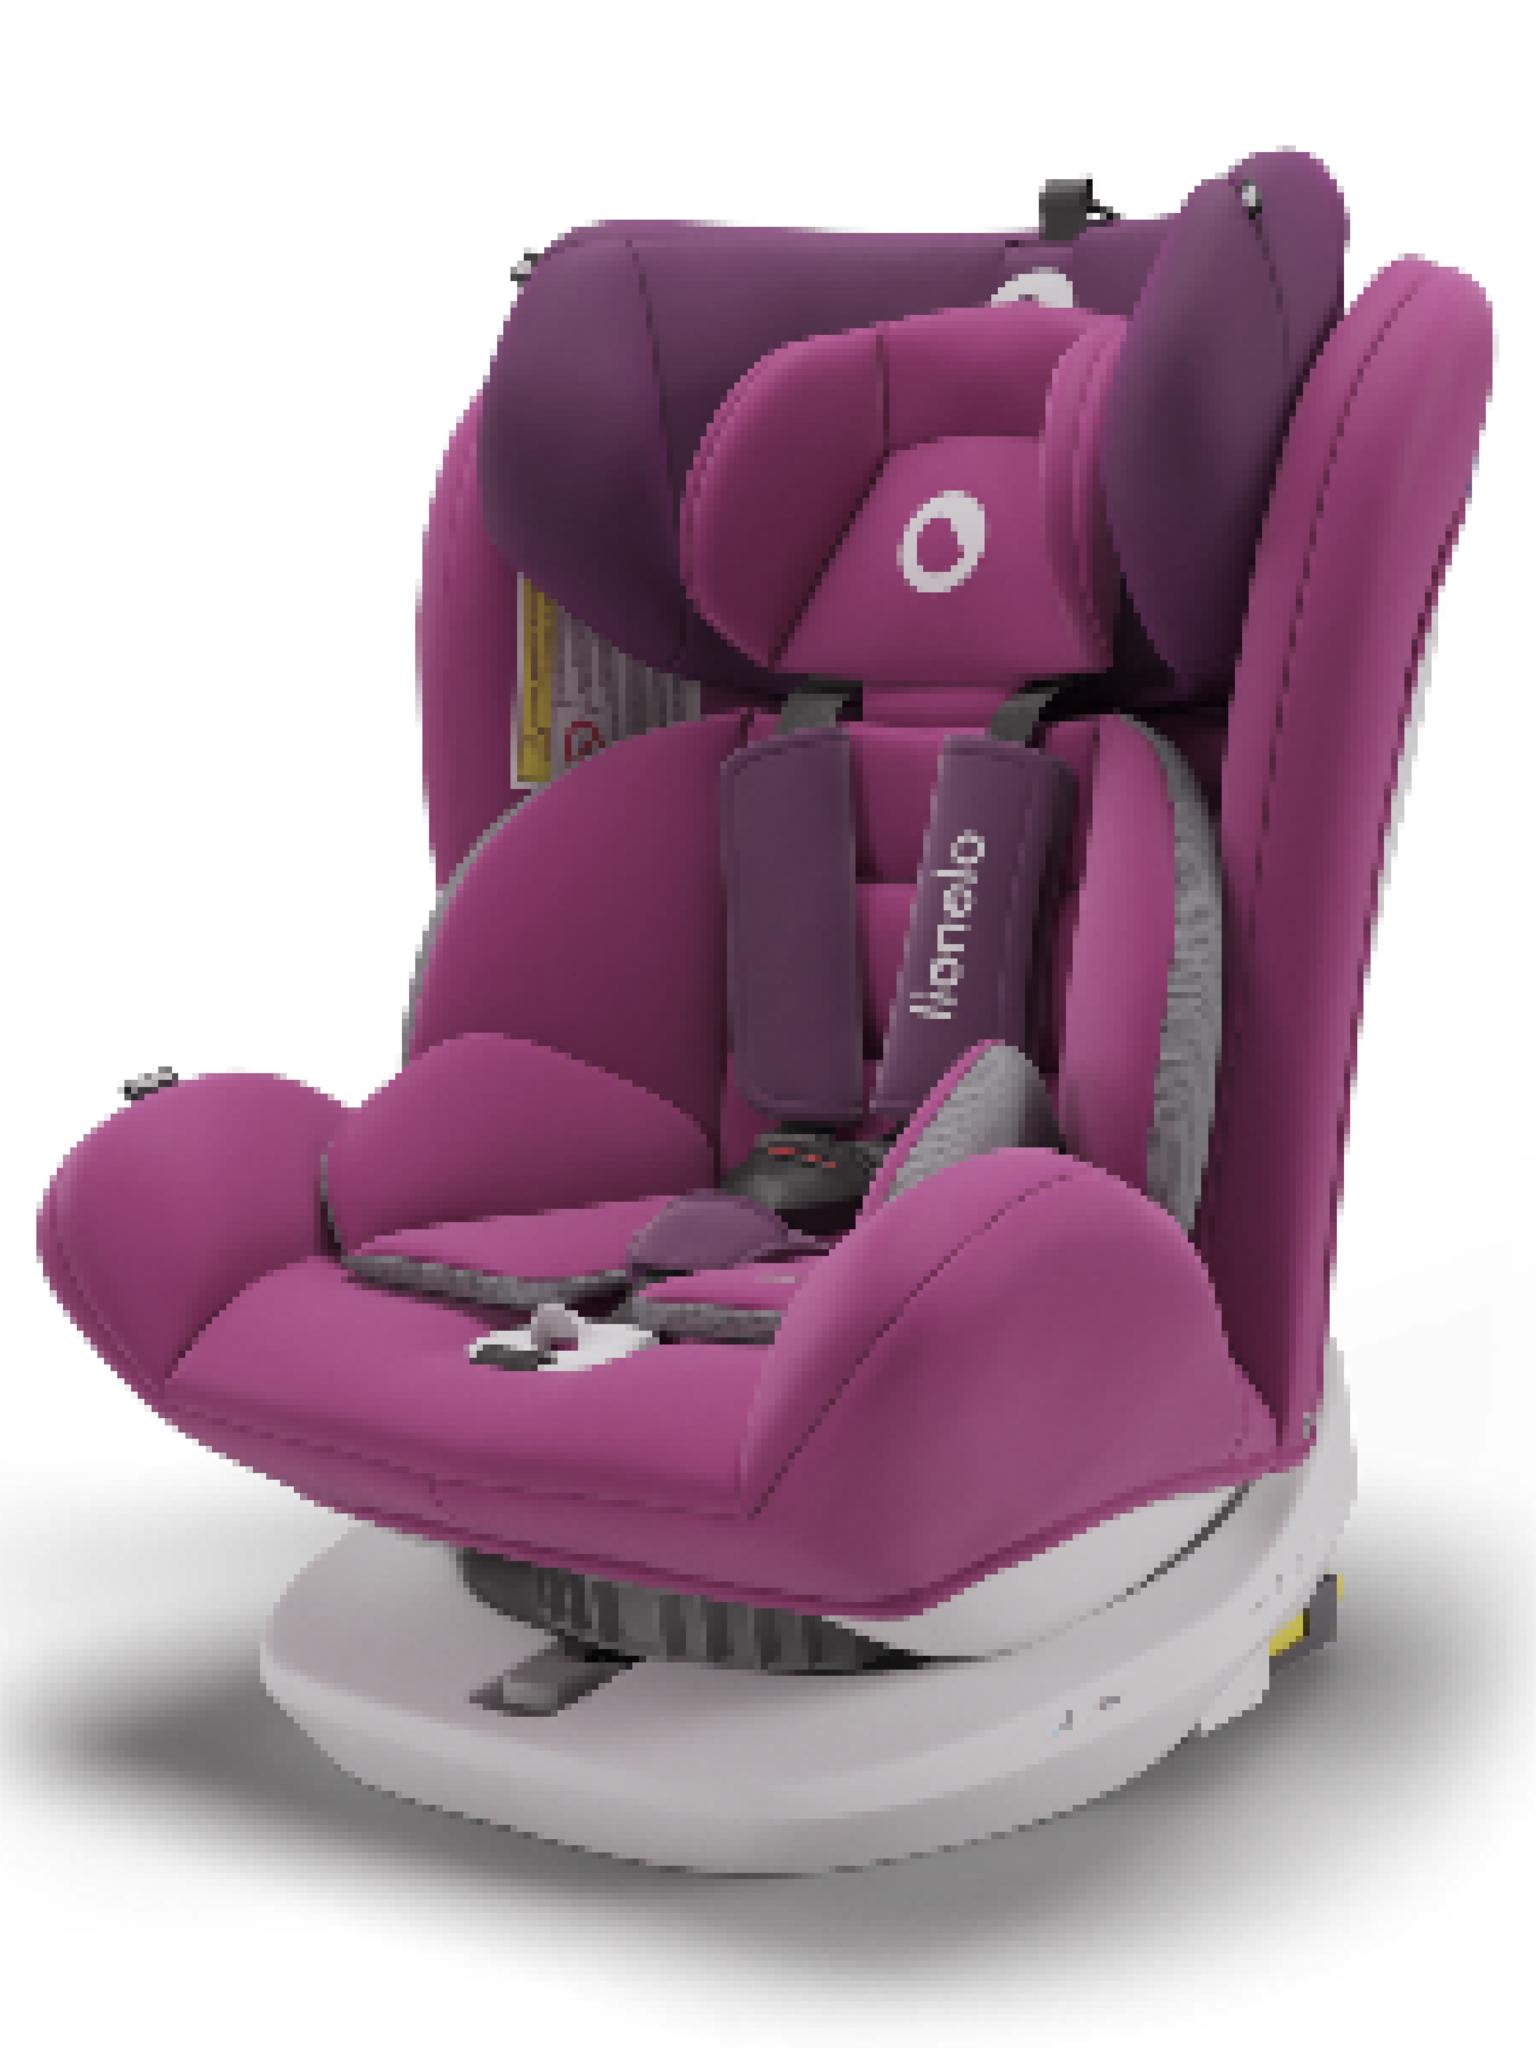 Автокресло Lionelo LO-Bastiaan 360 Violet